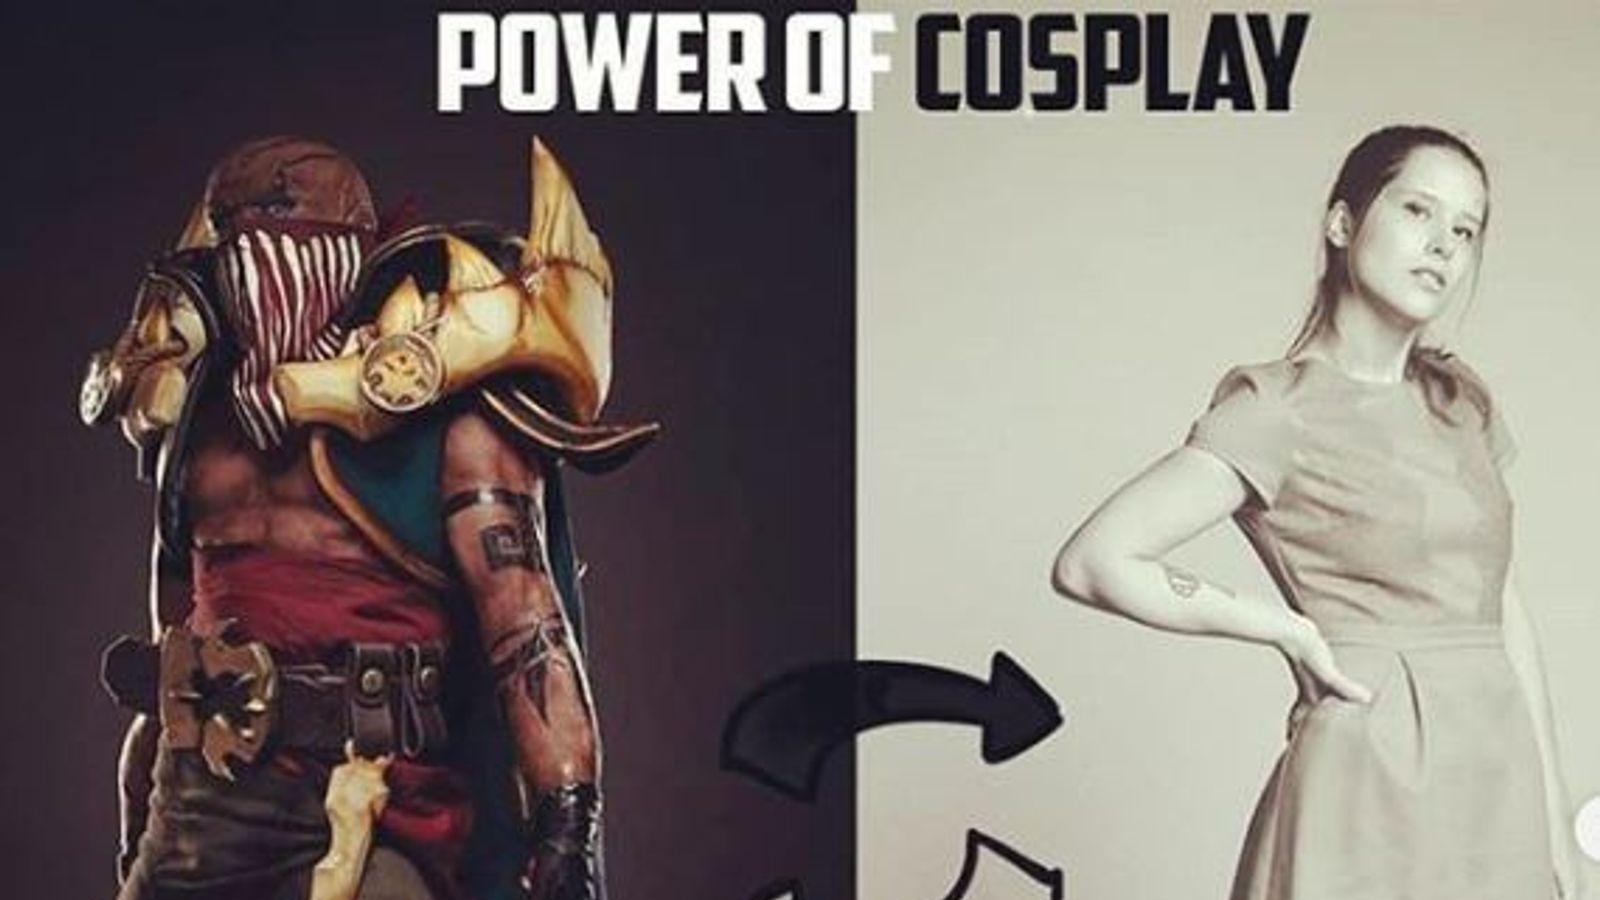 Cosplay controversy: Comic Con London defends blackface decision | Ents & Arts News